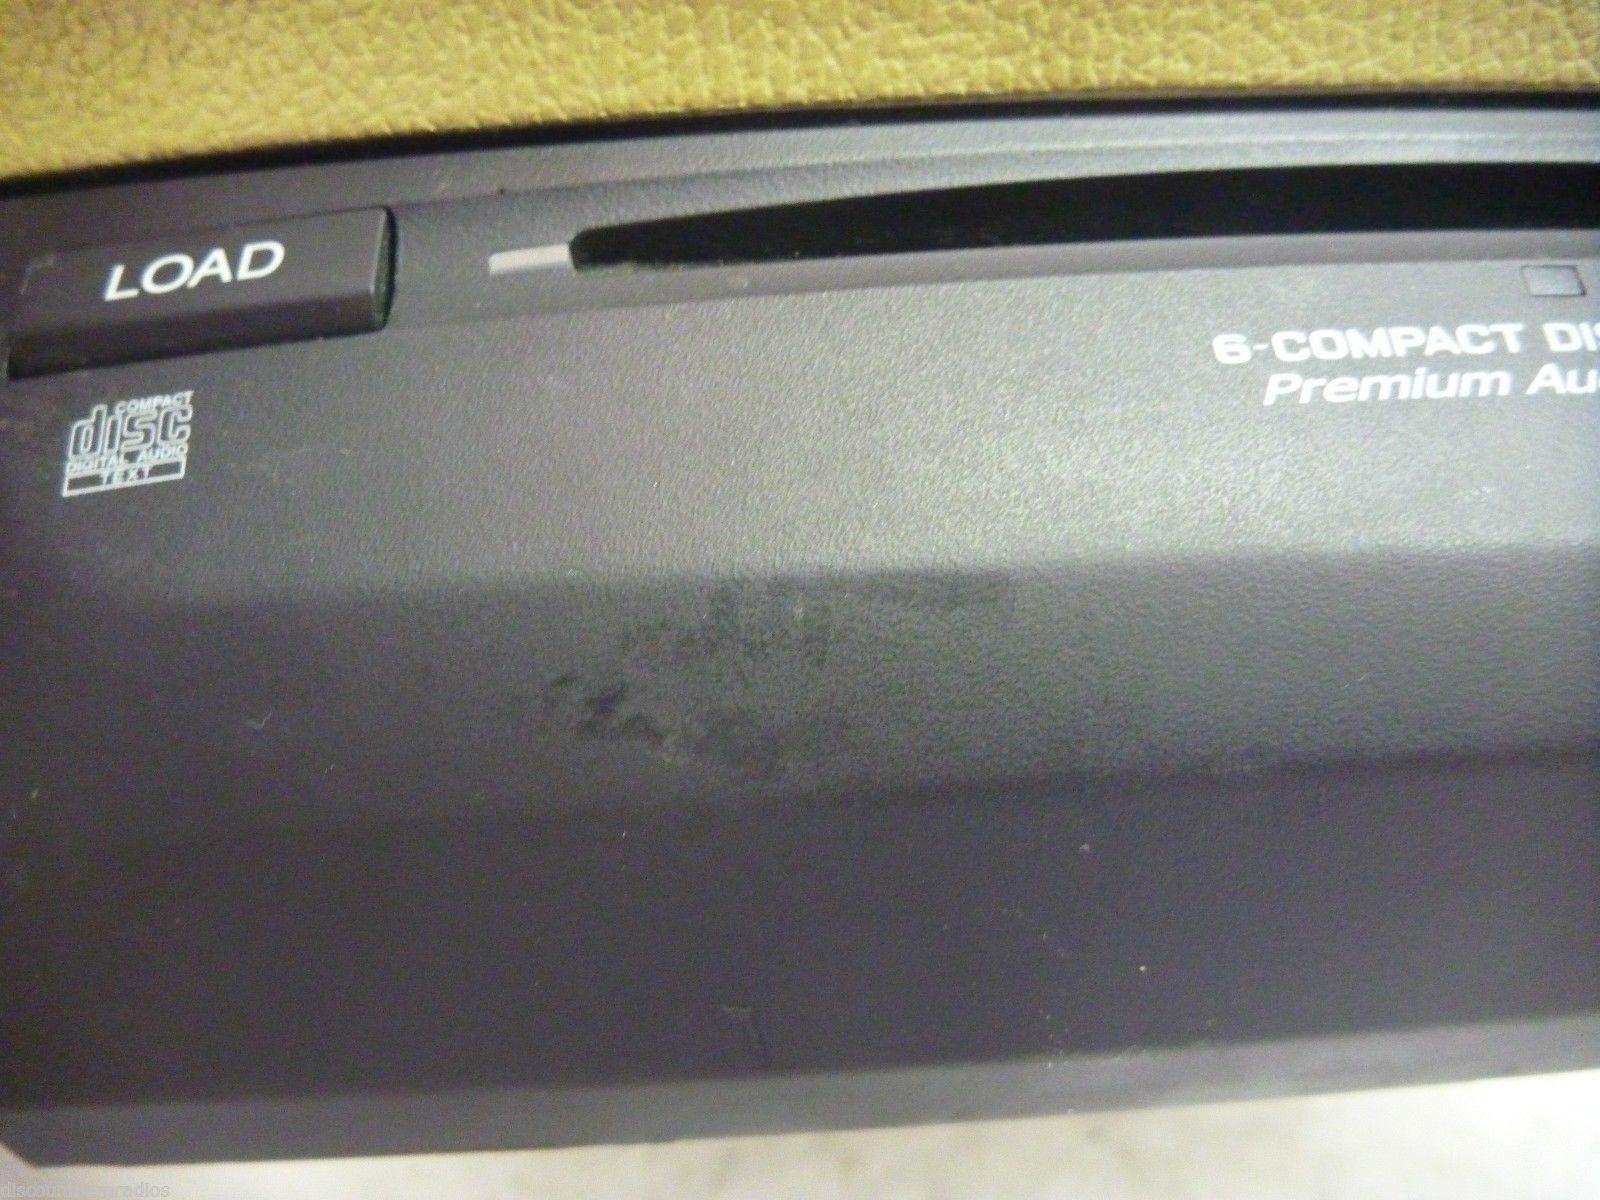 08 09 10 11 12 Honda Accord Premium Remote 6 Cd Player 39110-TA0-A012  C50103